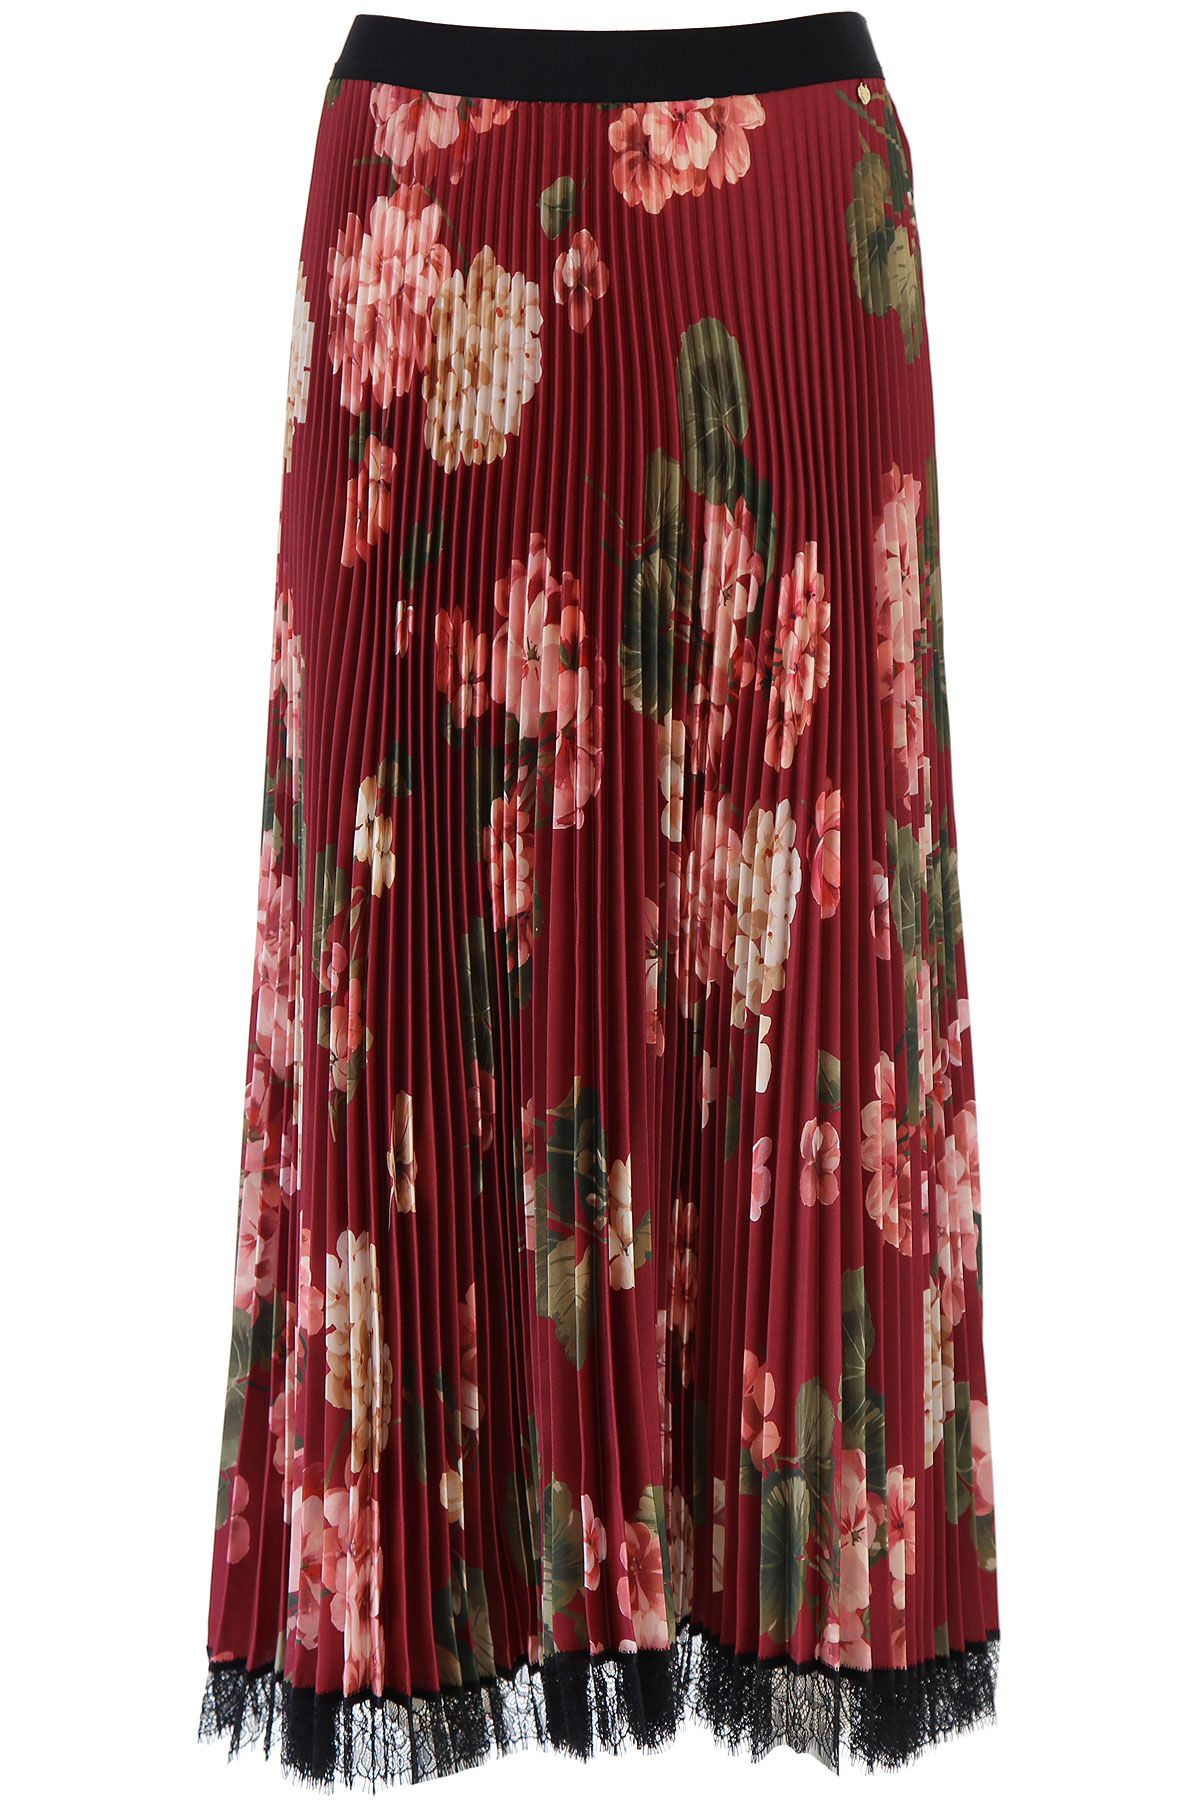 premium selection df658 ed363 Womens Clothing Twin Set by Simona Barbieri, Style code ...